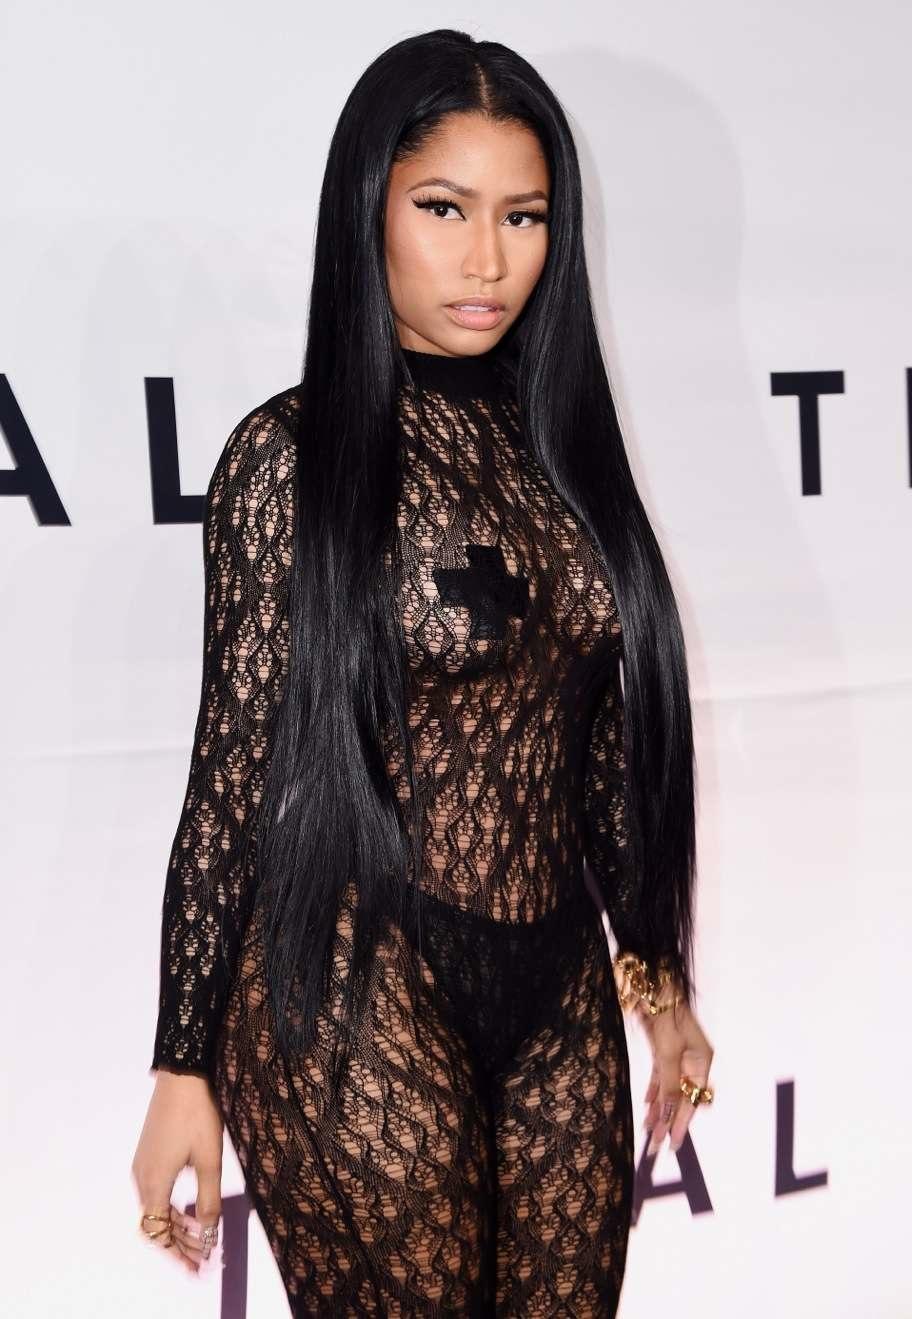 Minaj fappening nicki The Fappening